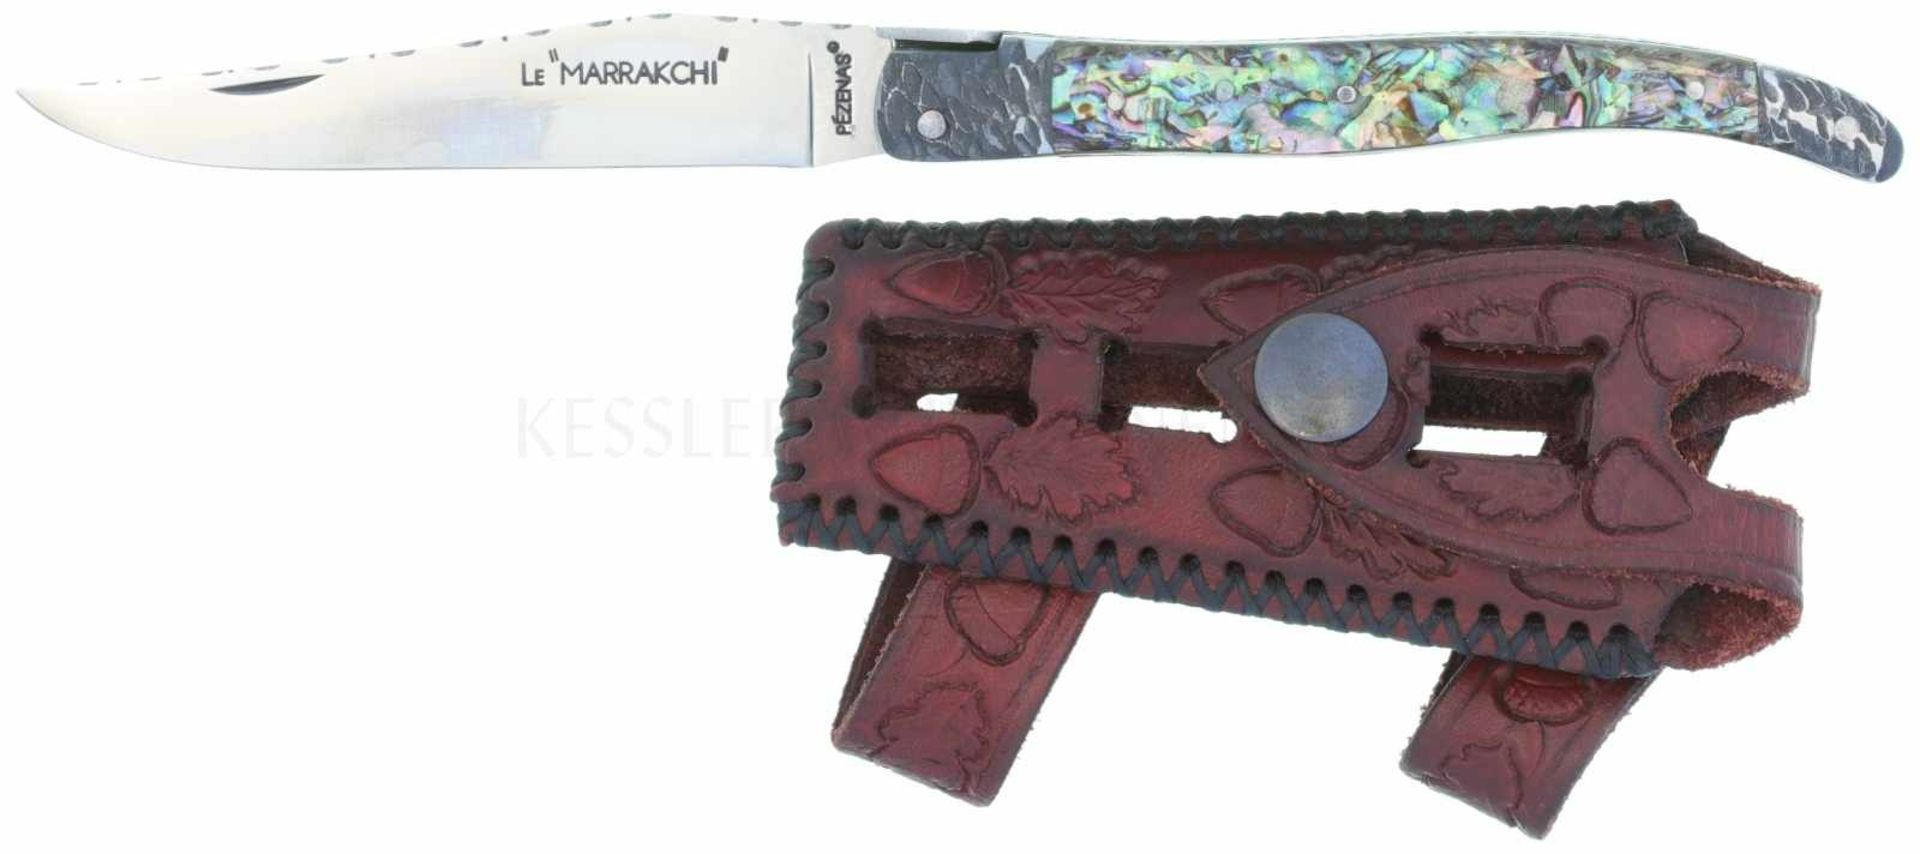 "Los 47 - Messer, La Guiole, ""Le Marrakchi"" KL 100mm, TL 216mm, polierte Klinge, Rücken mit Zierfeilungen,"